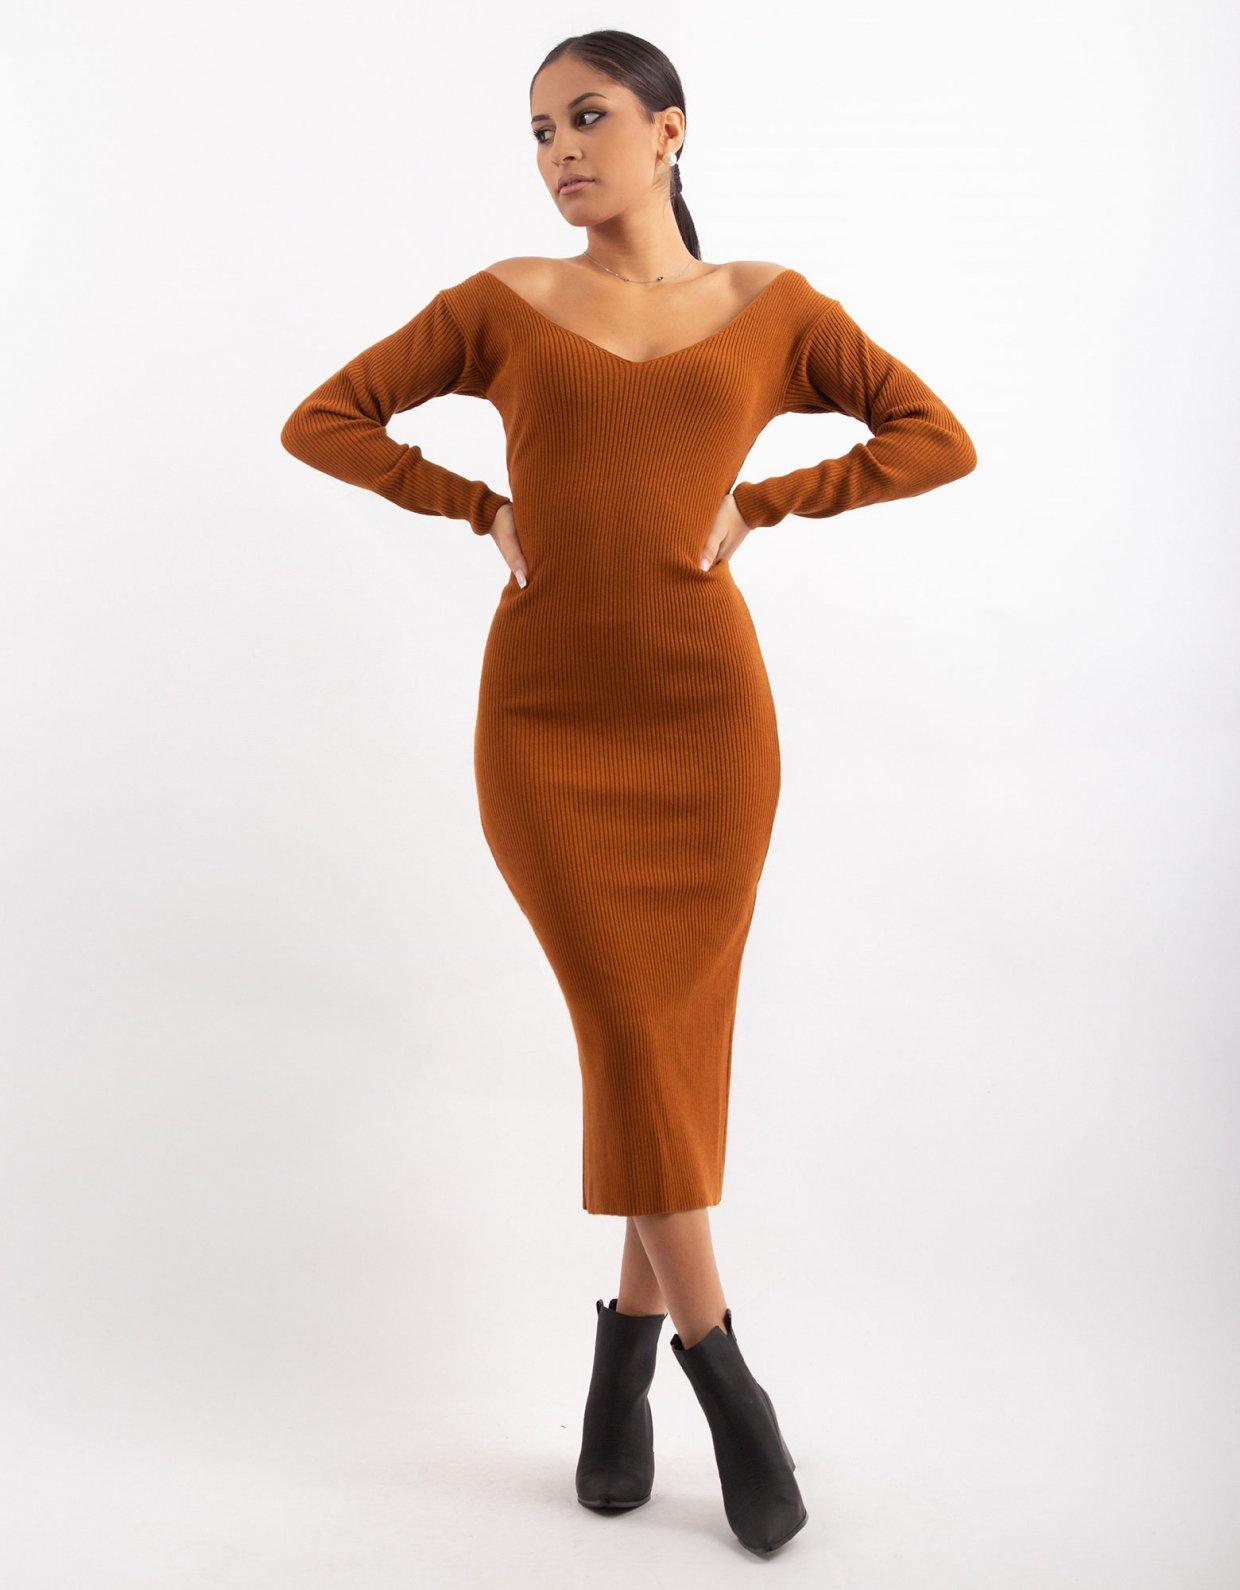 Combos Knitwear Combos W7 – Cinnamon V-neck midi dress